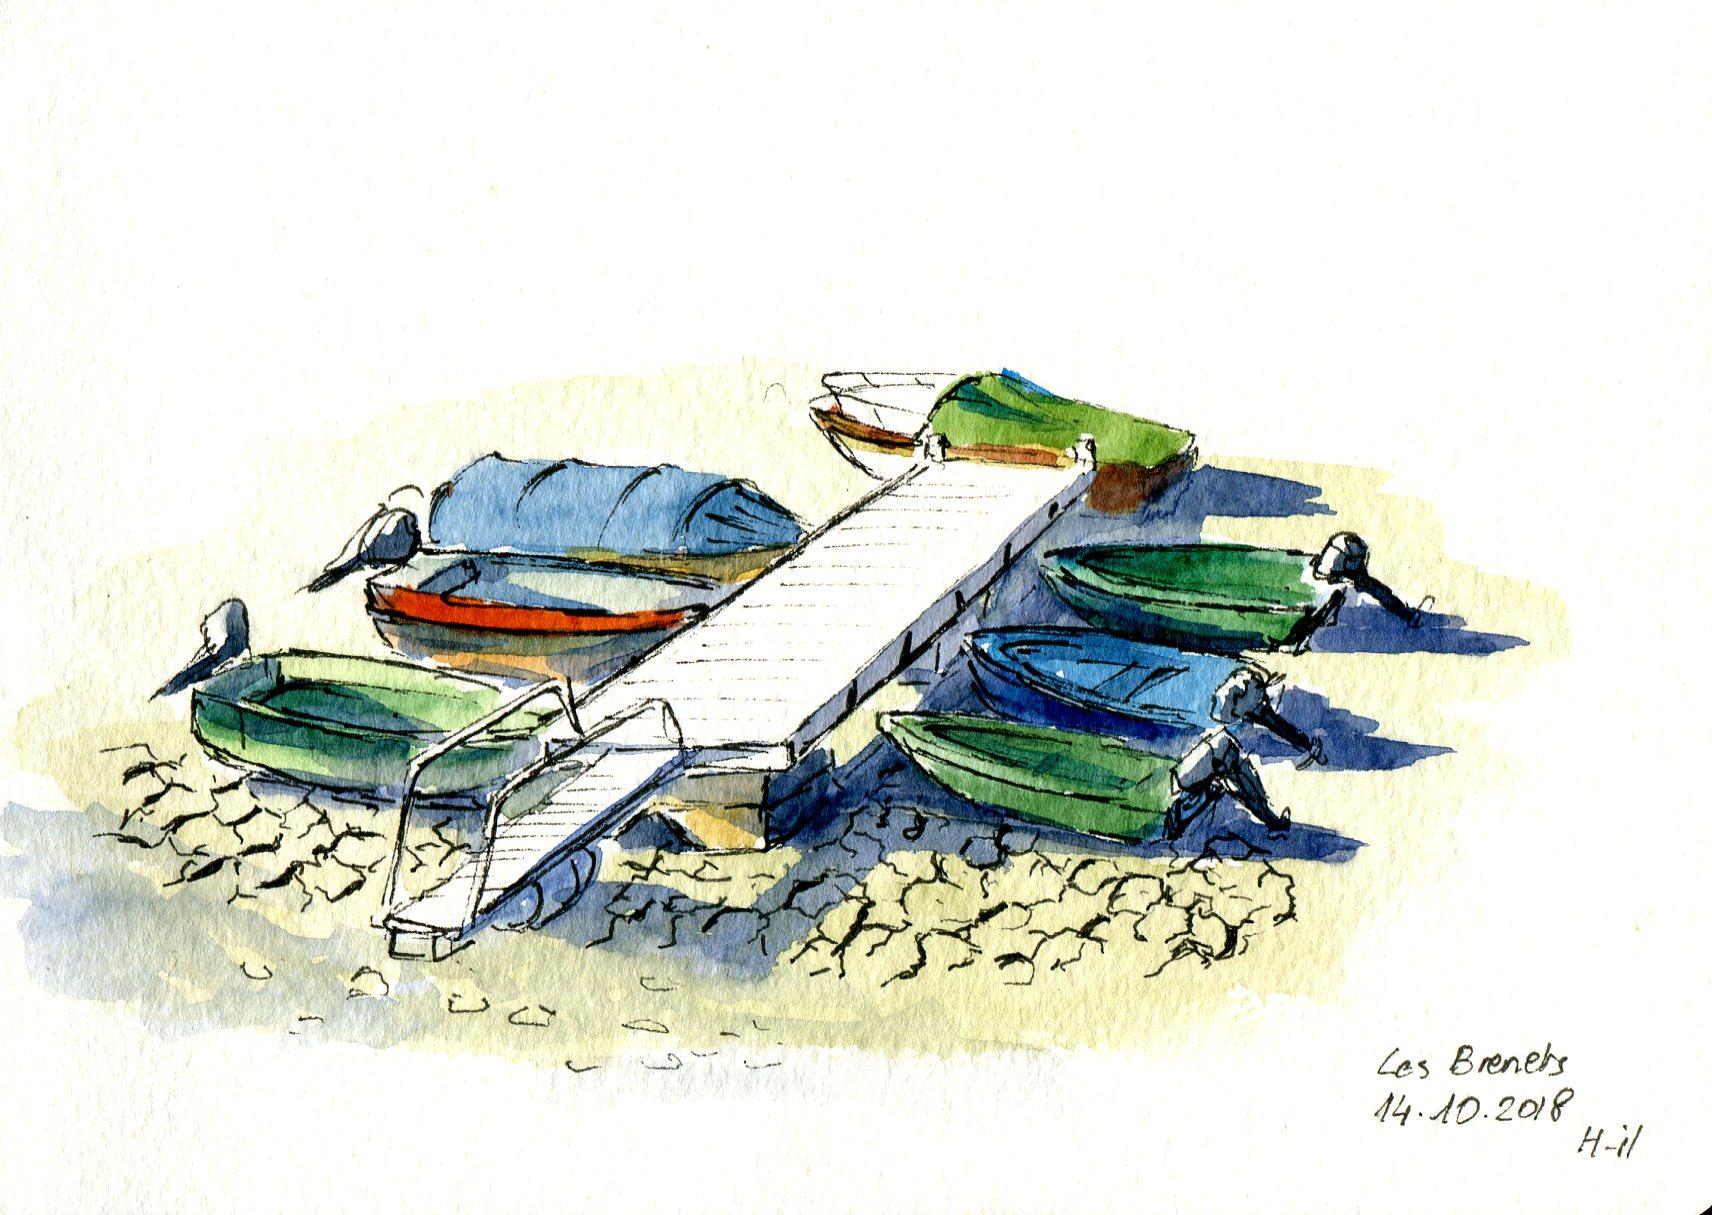 Lac des Brenets091